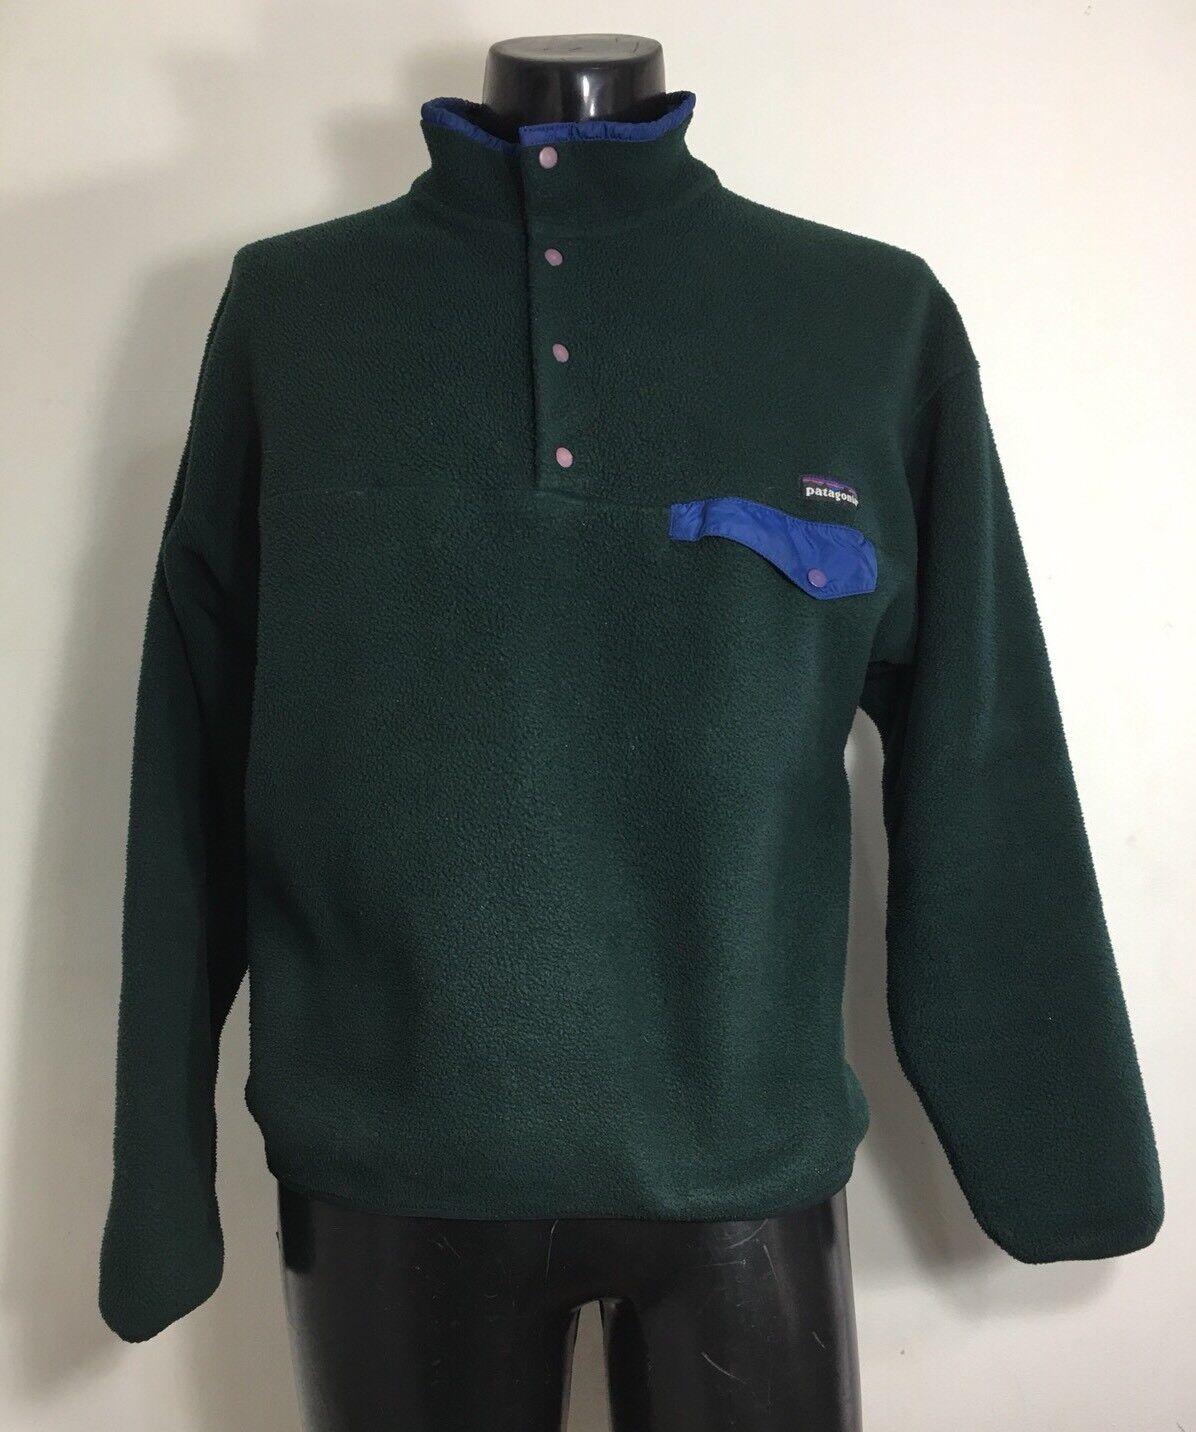 Vintage Patagonia Men's Snap T Grün Fleece Pullover Größe XL